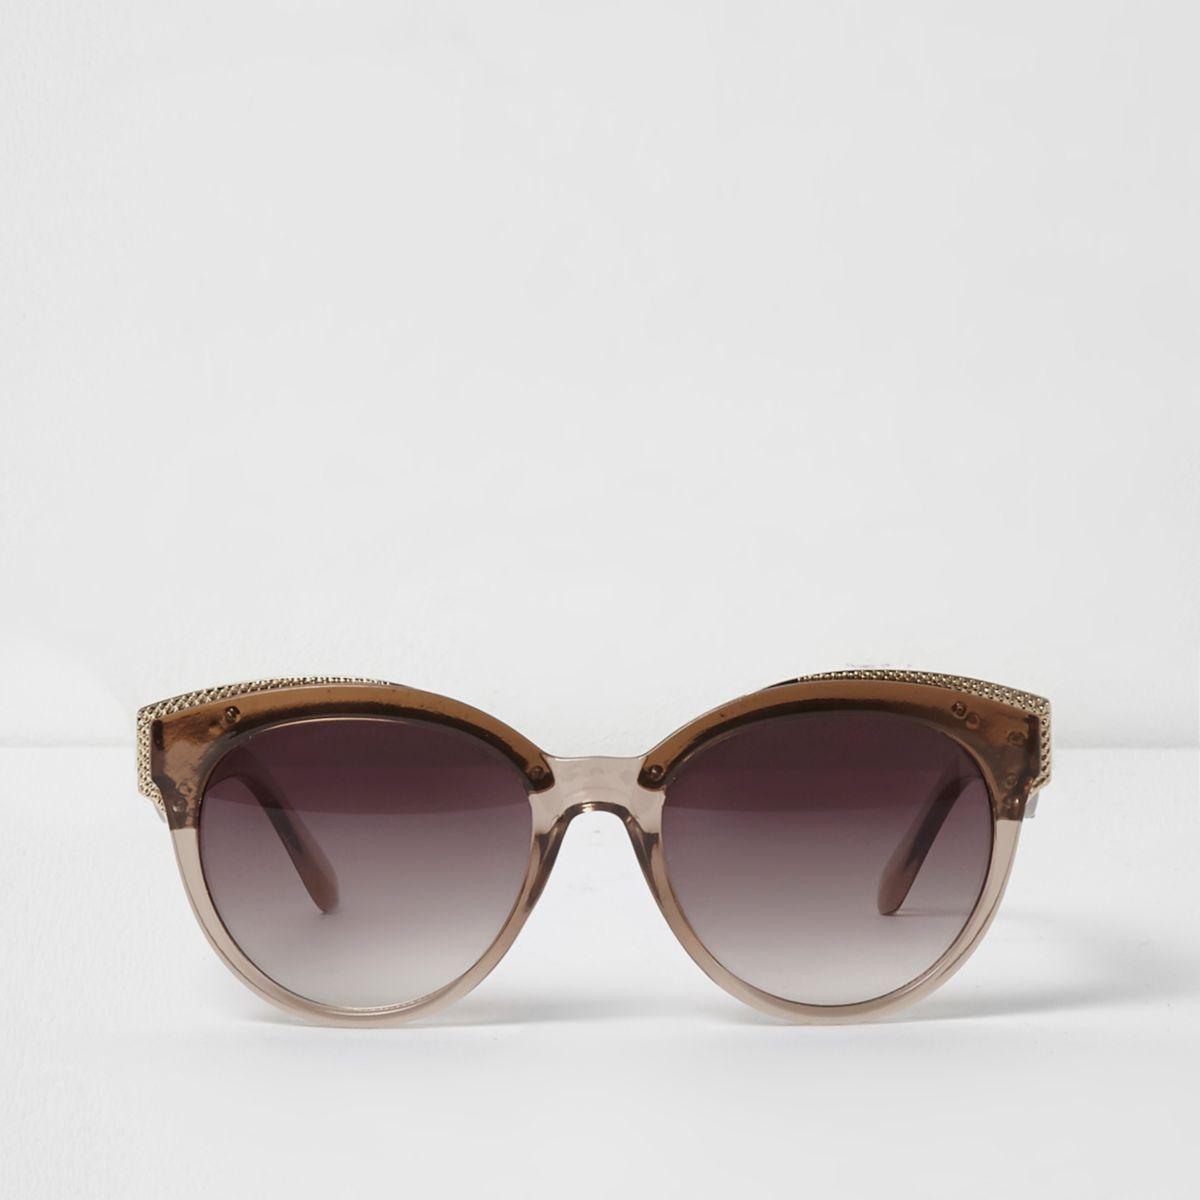 Beige clear gold tone cat eye sunglasses